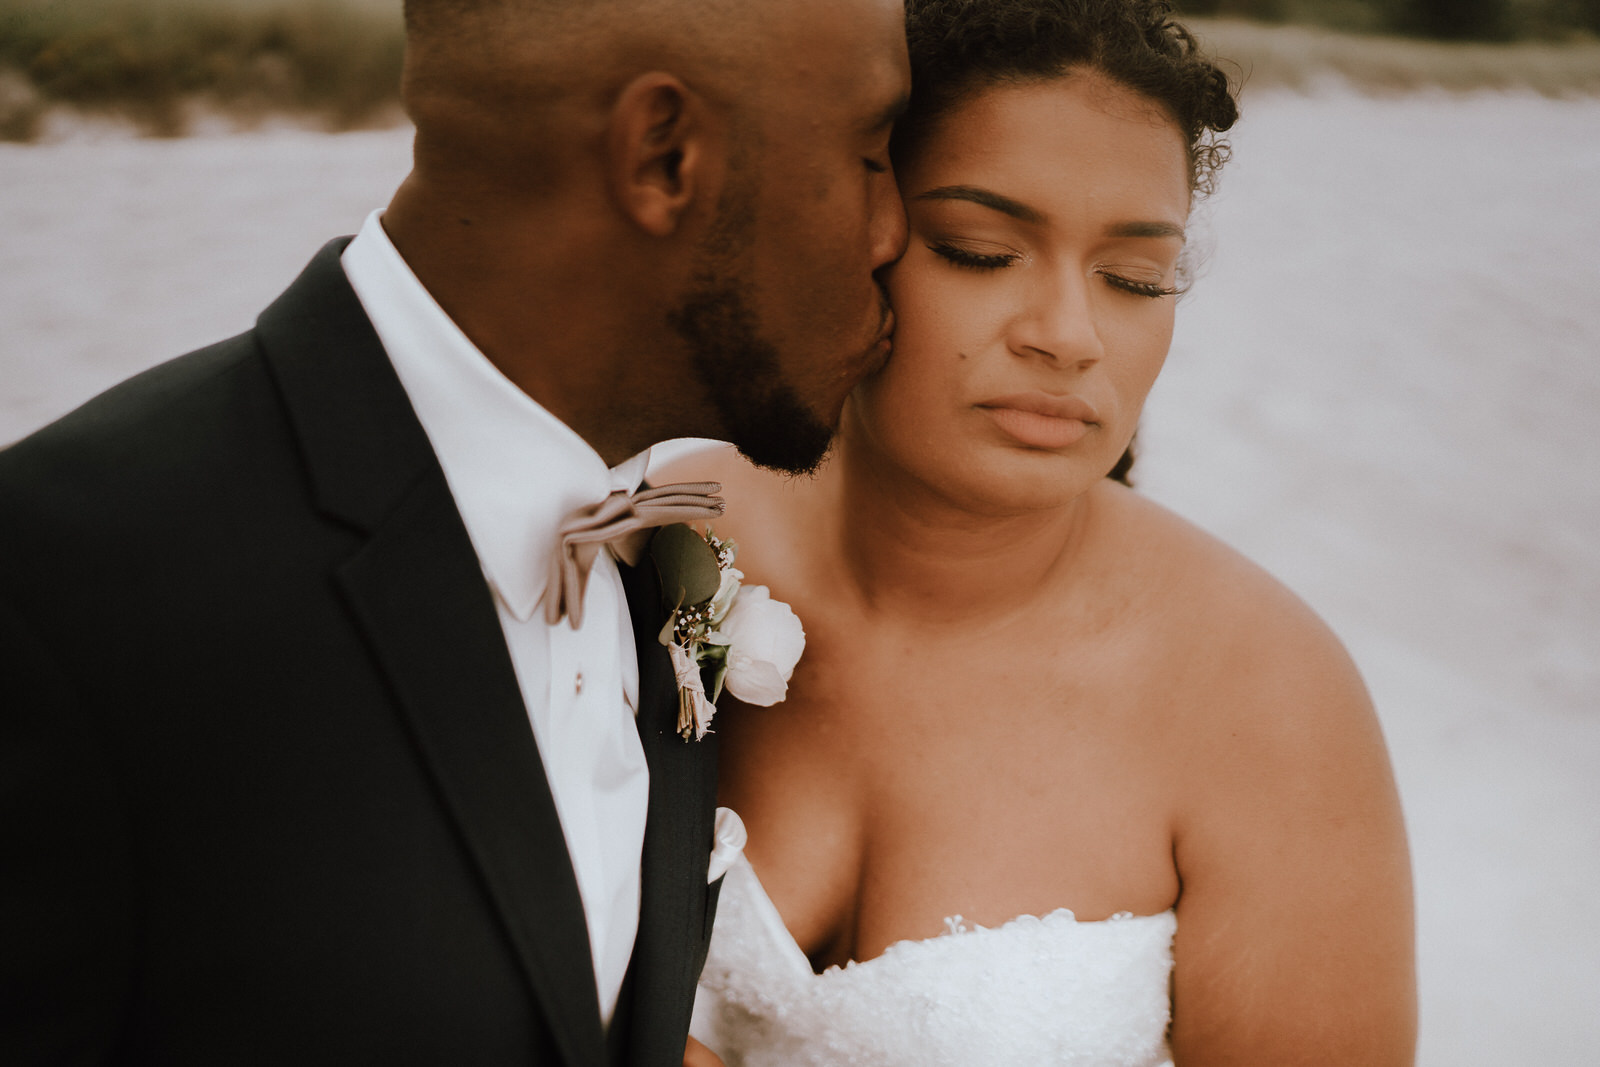 South Seas Island Resort Elopement- Alyana and Shawn- Michelle Gonzalez Photography-215.JPG